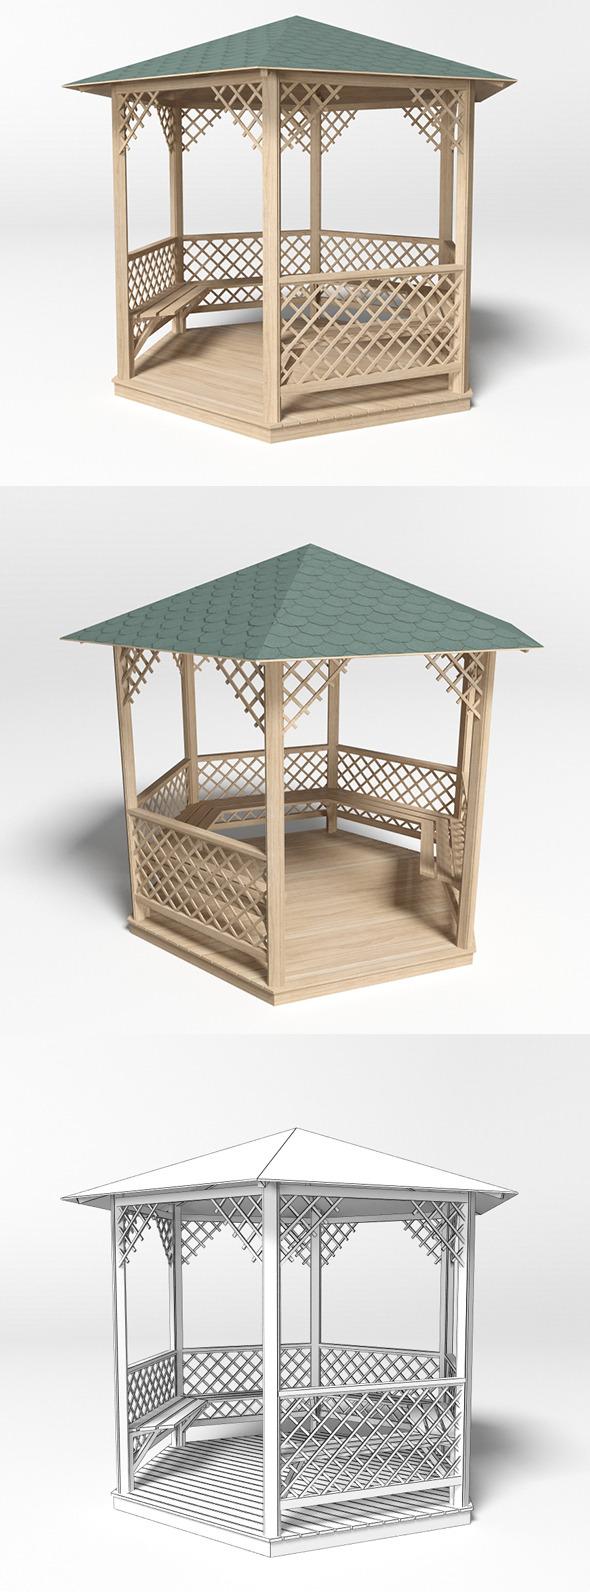 Gazebo 1 - 3DOcean Item for Sale